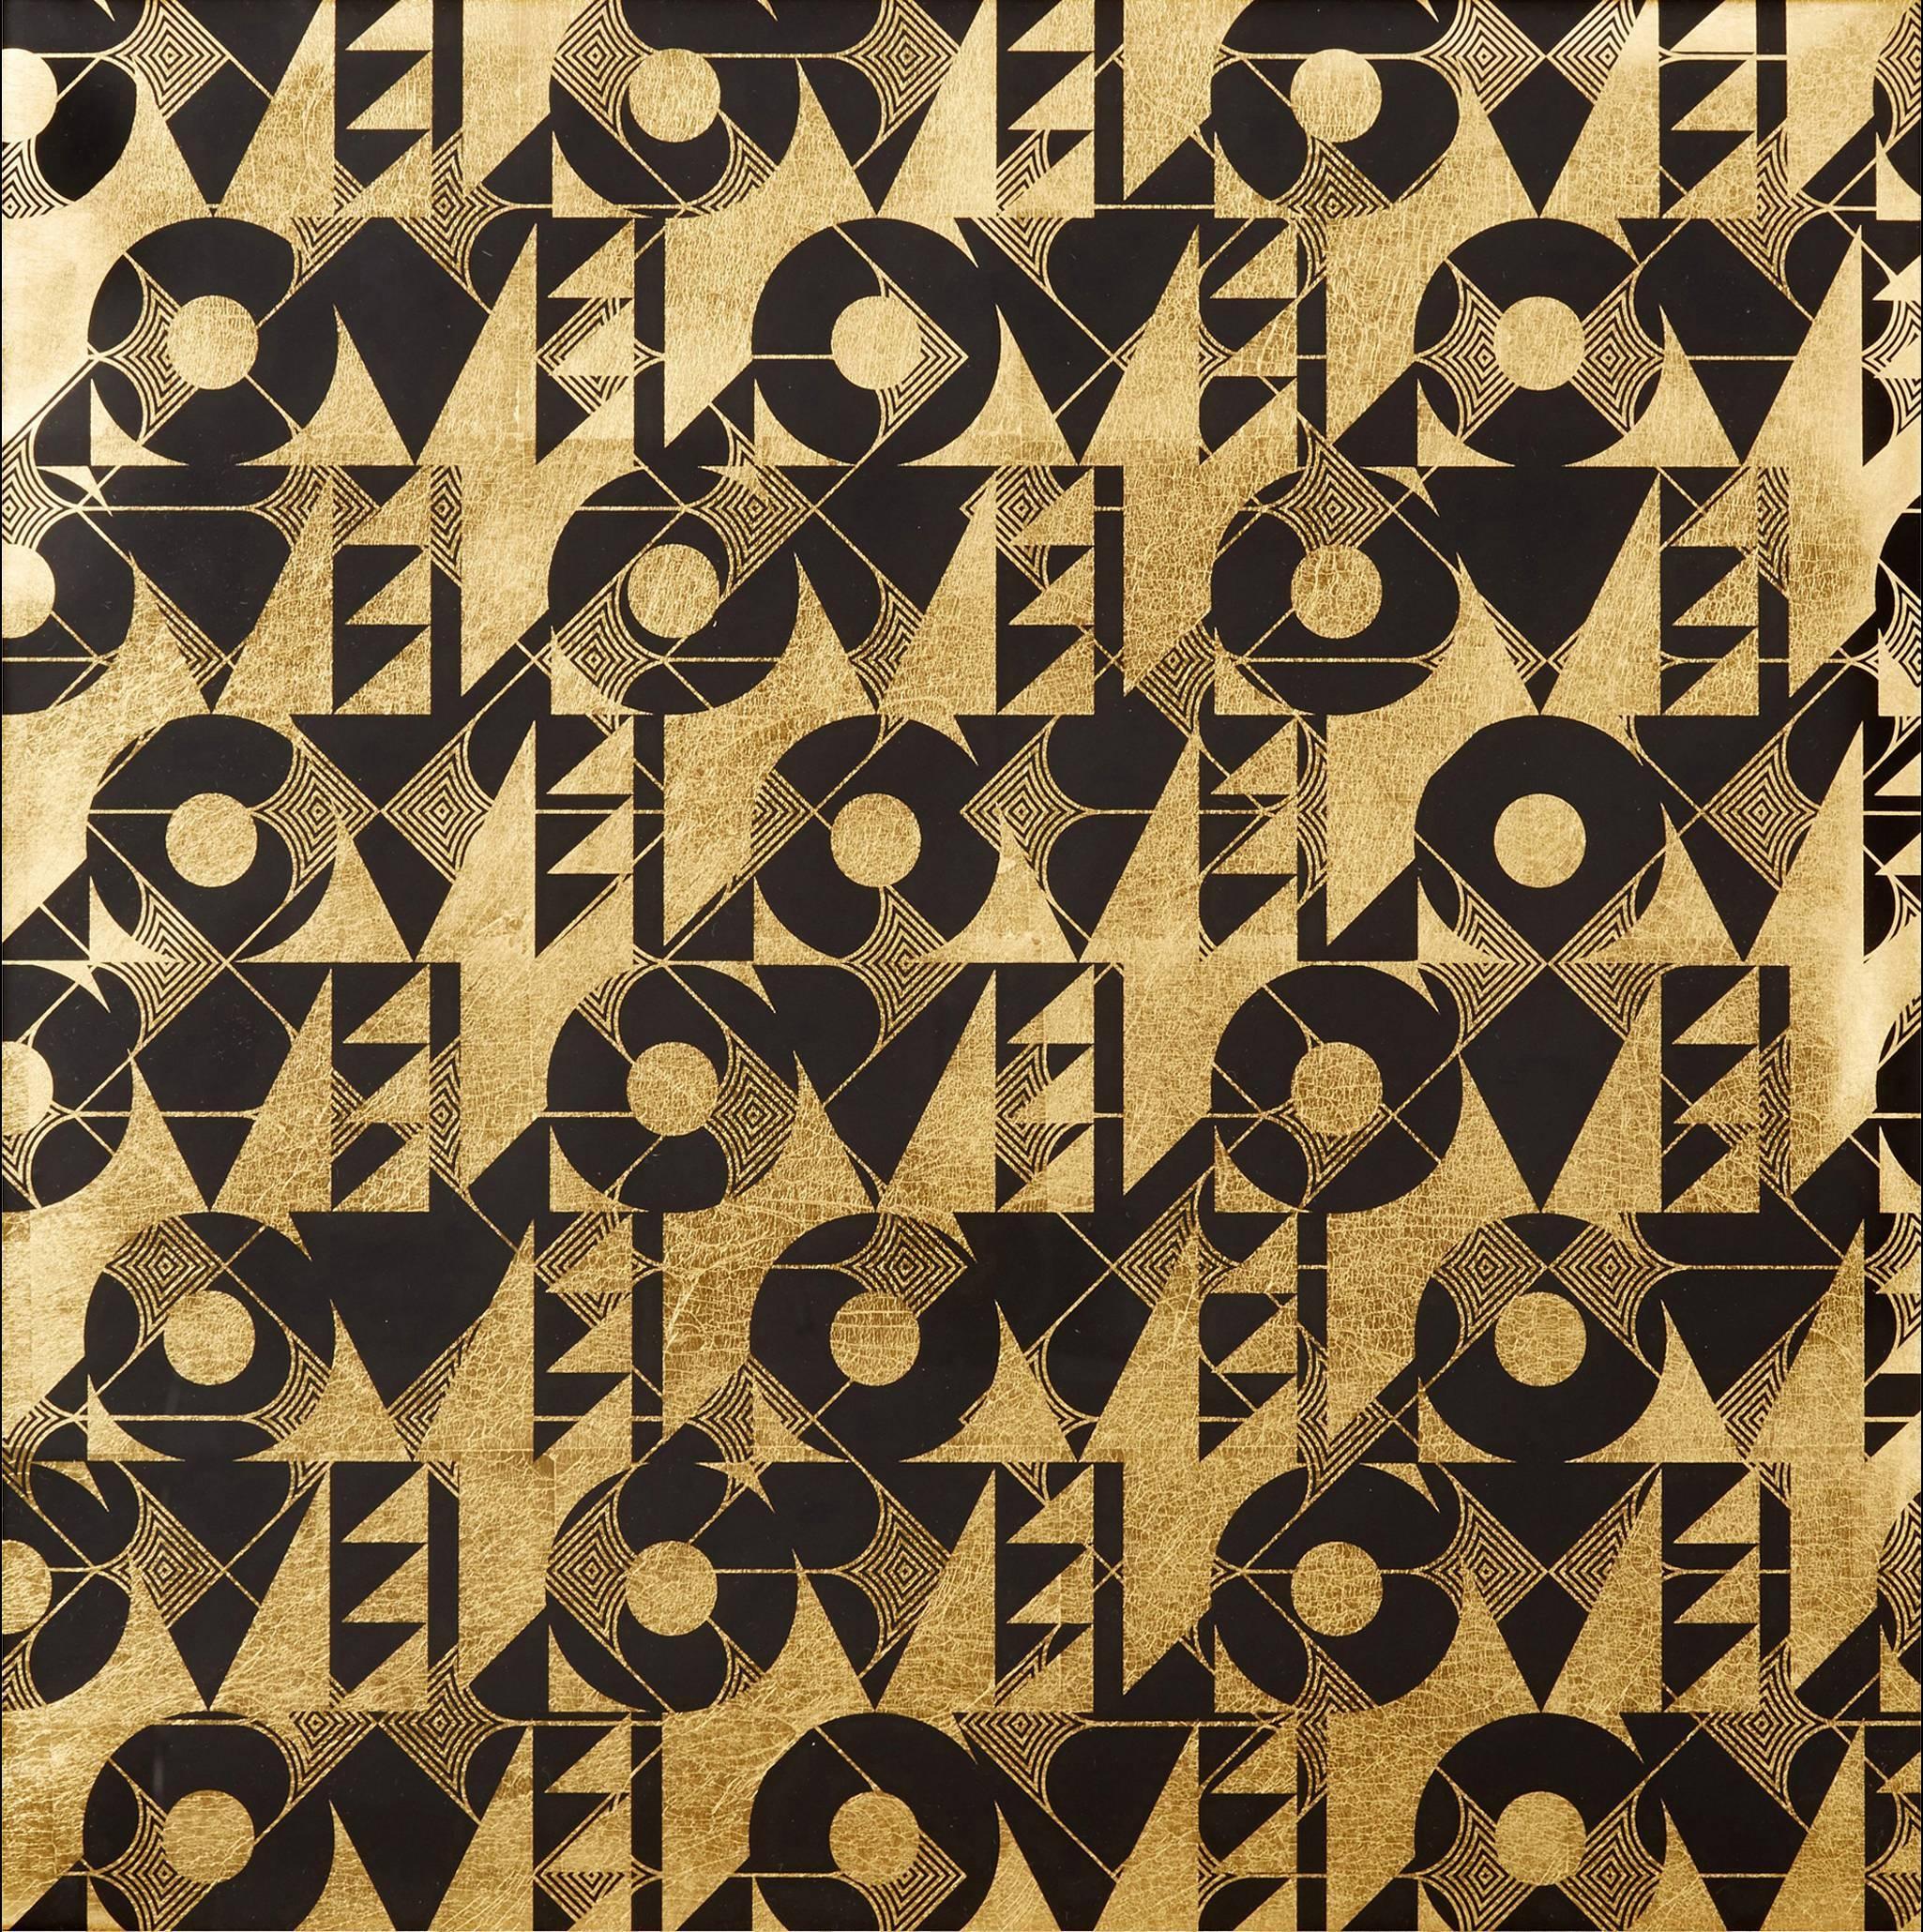 Love and Arrows II (design gold black metallic work on paper Art Deco pattern)